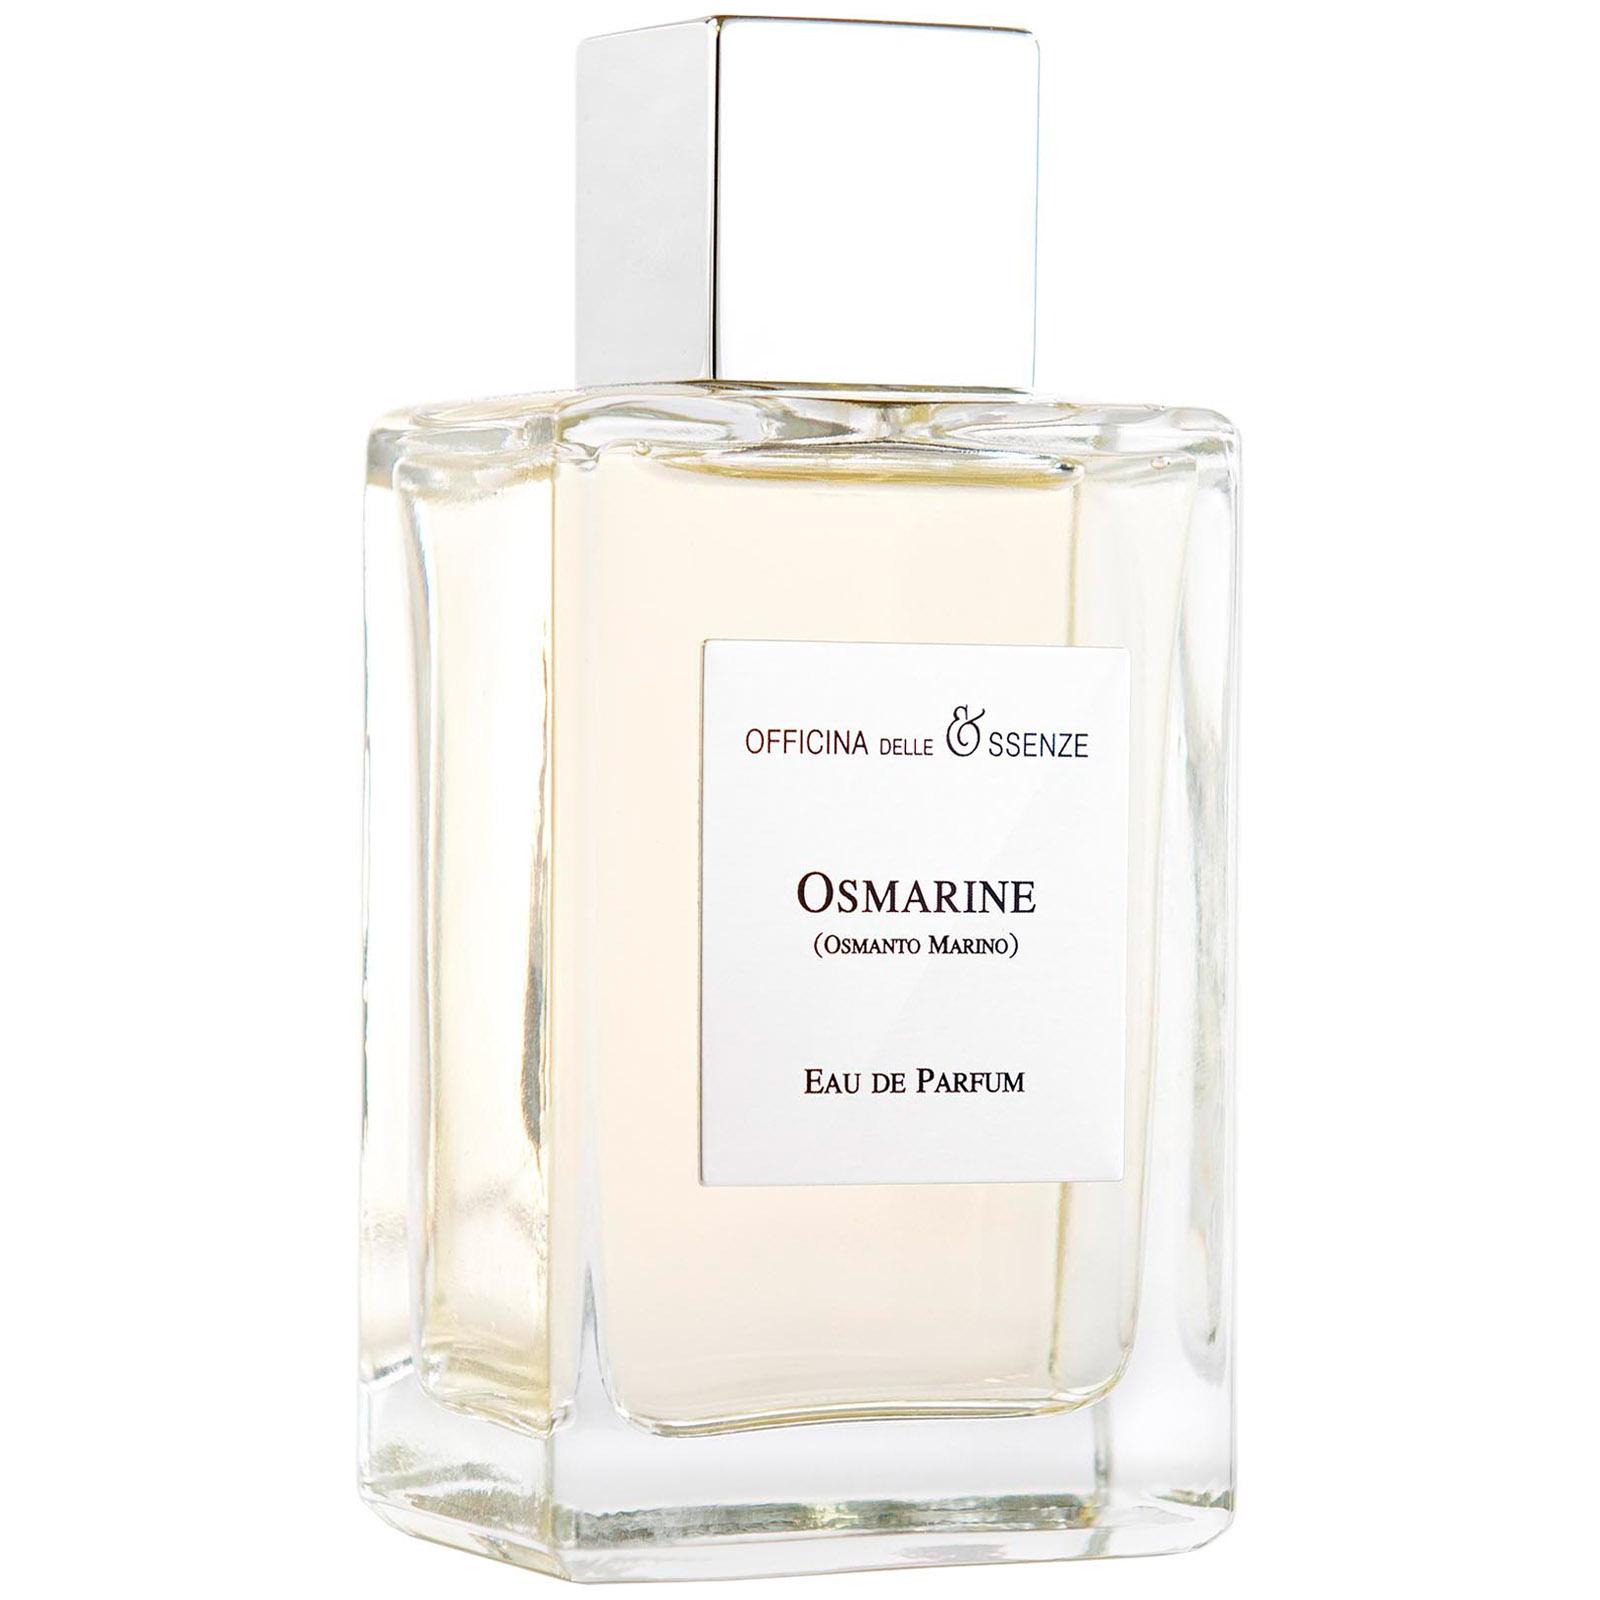 Osmarine profumo eau de parfum 100 ml